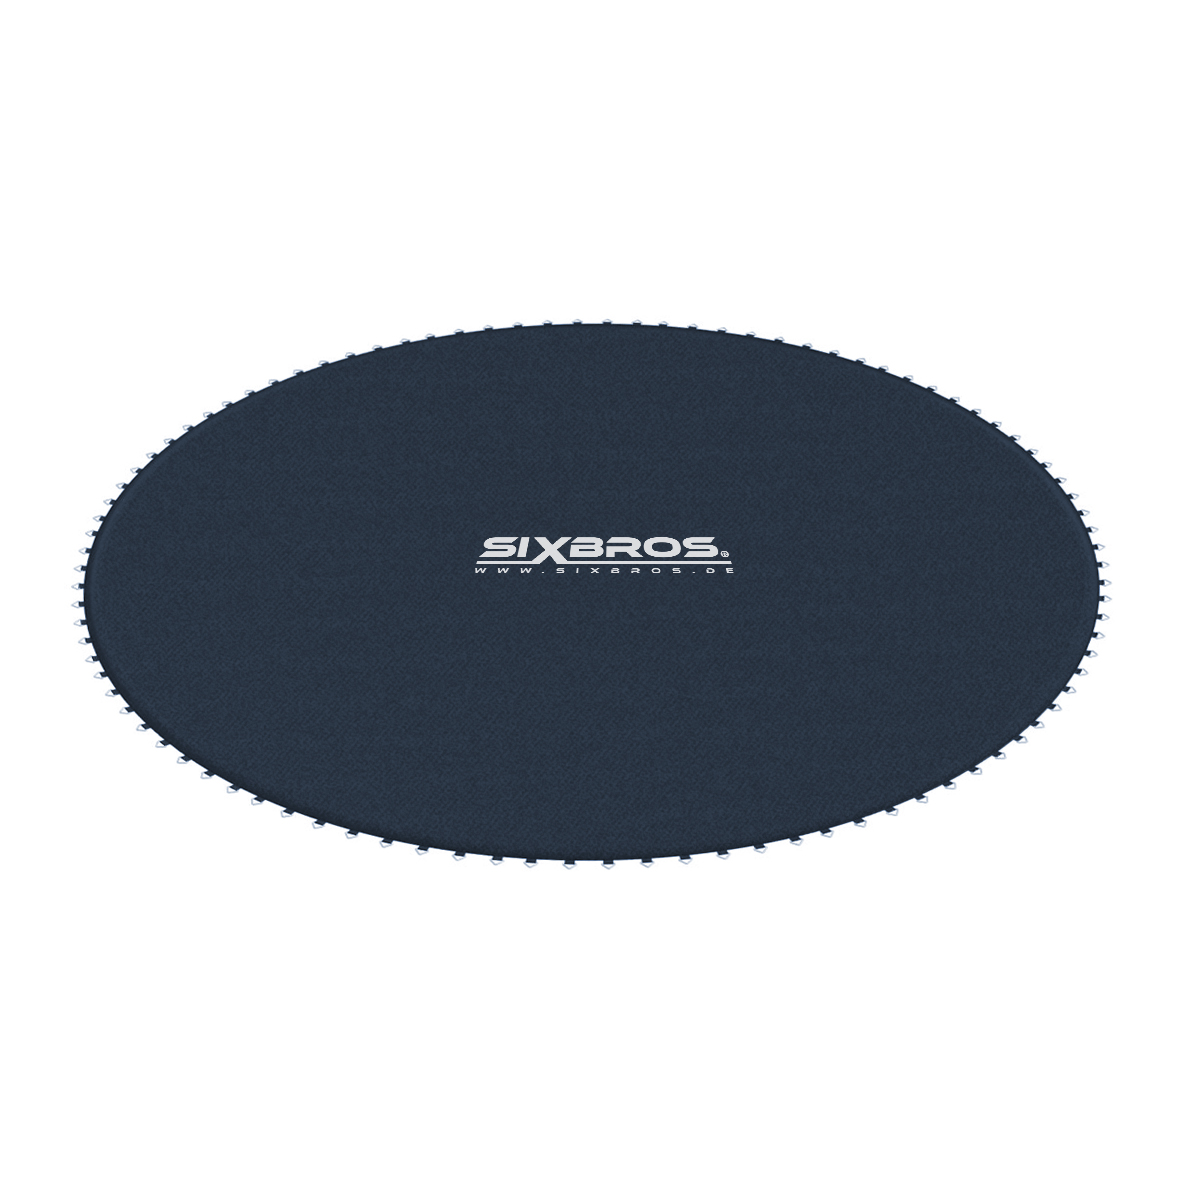 tapis de saut pour trampolines de jardin 185 460 cm sixbros ebay. Black Bedroom Furniture Sets. Home Design Ideas